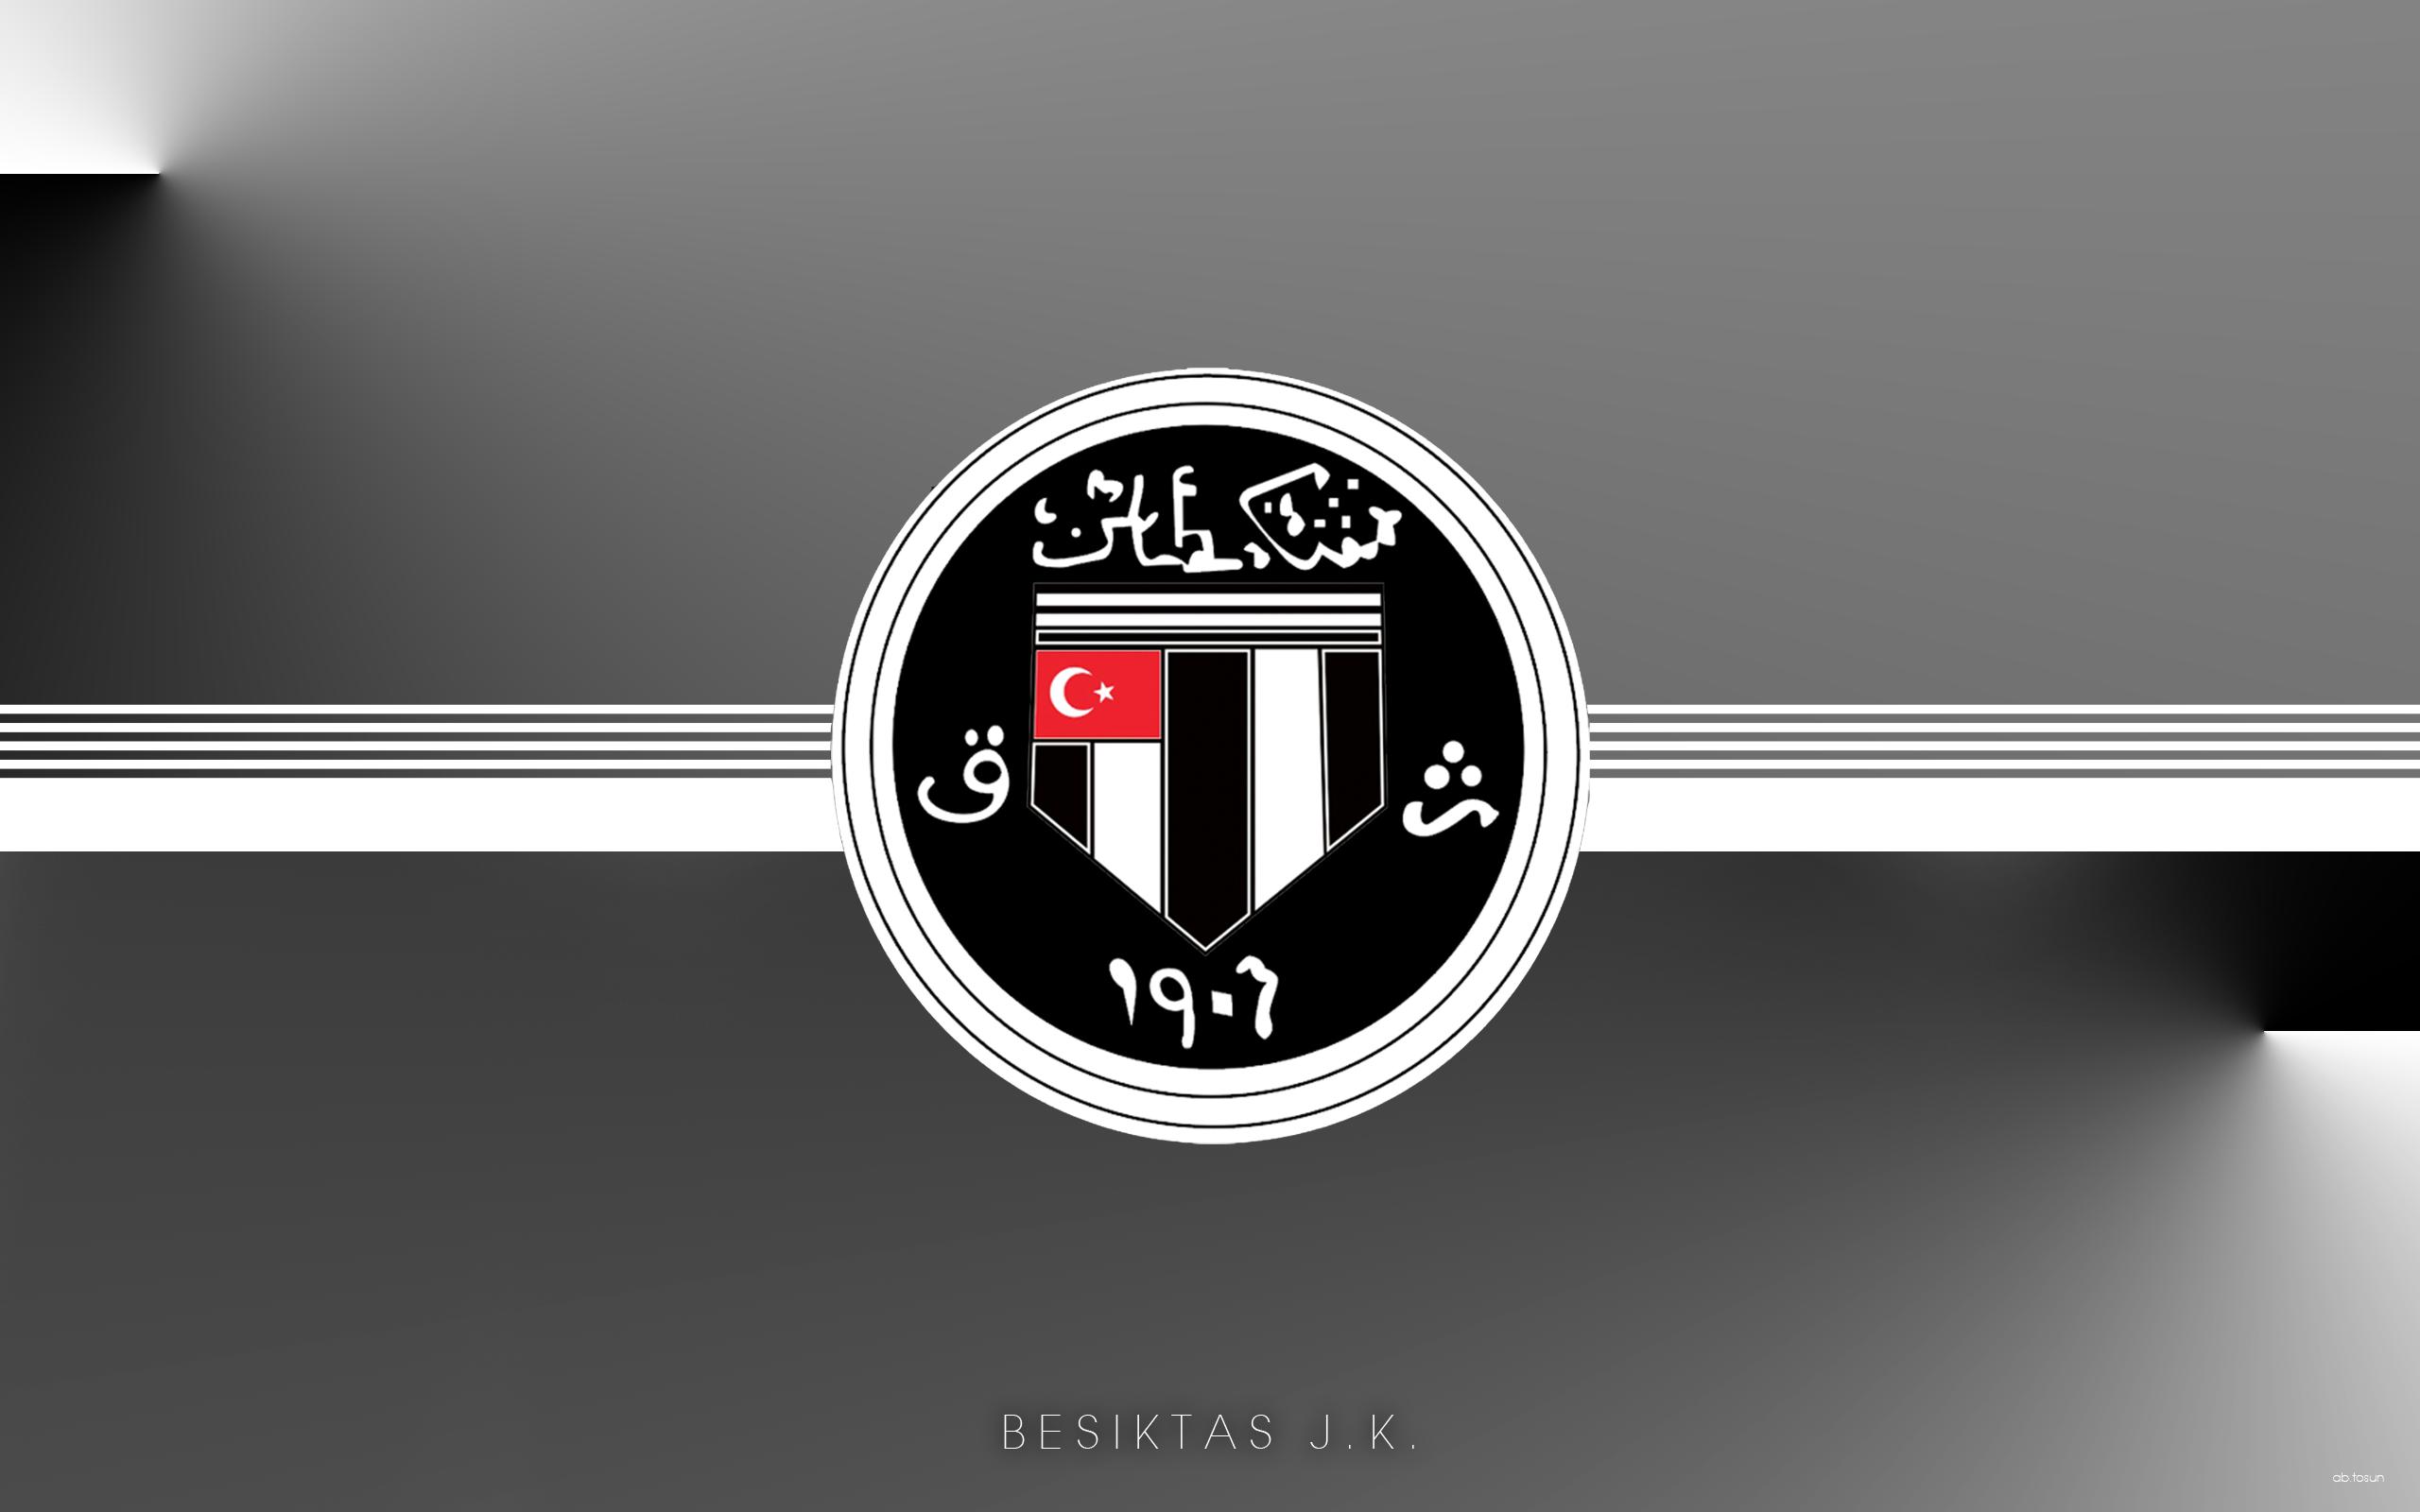 Beşiktaş hd fotoğrafı